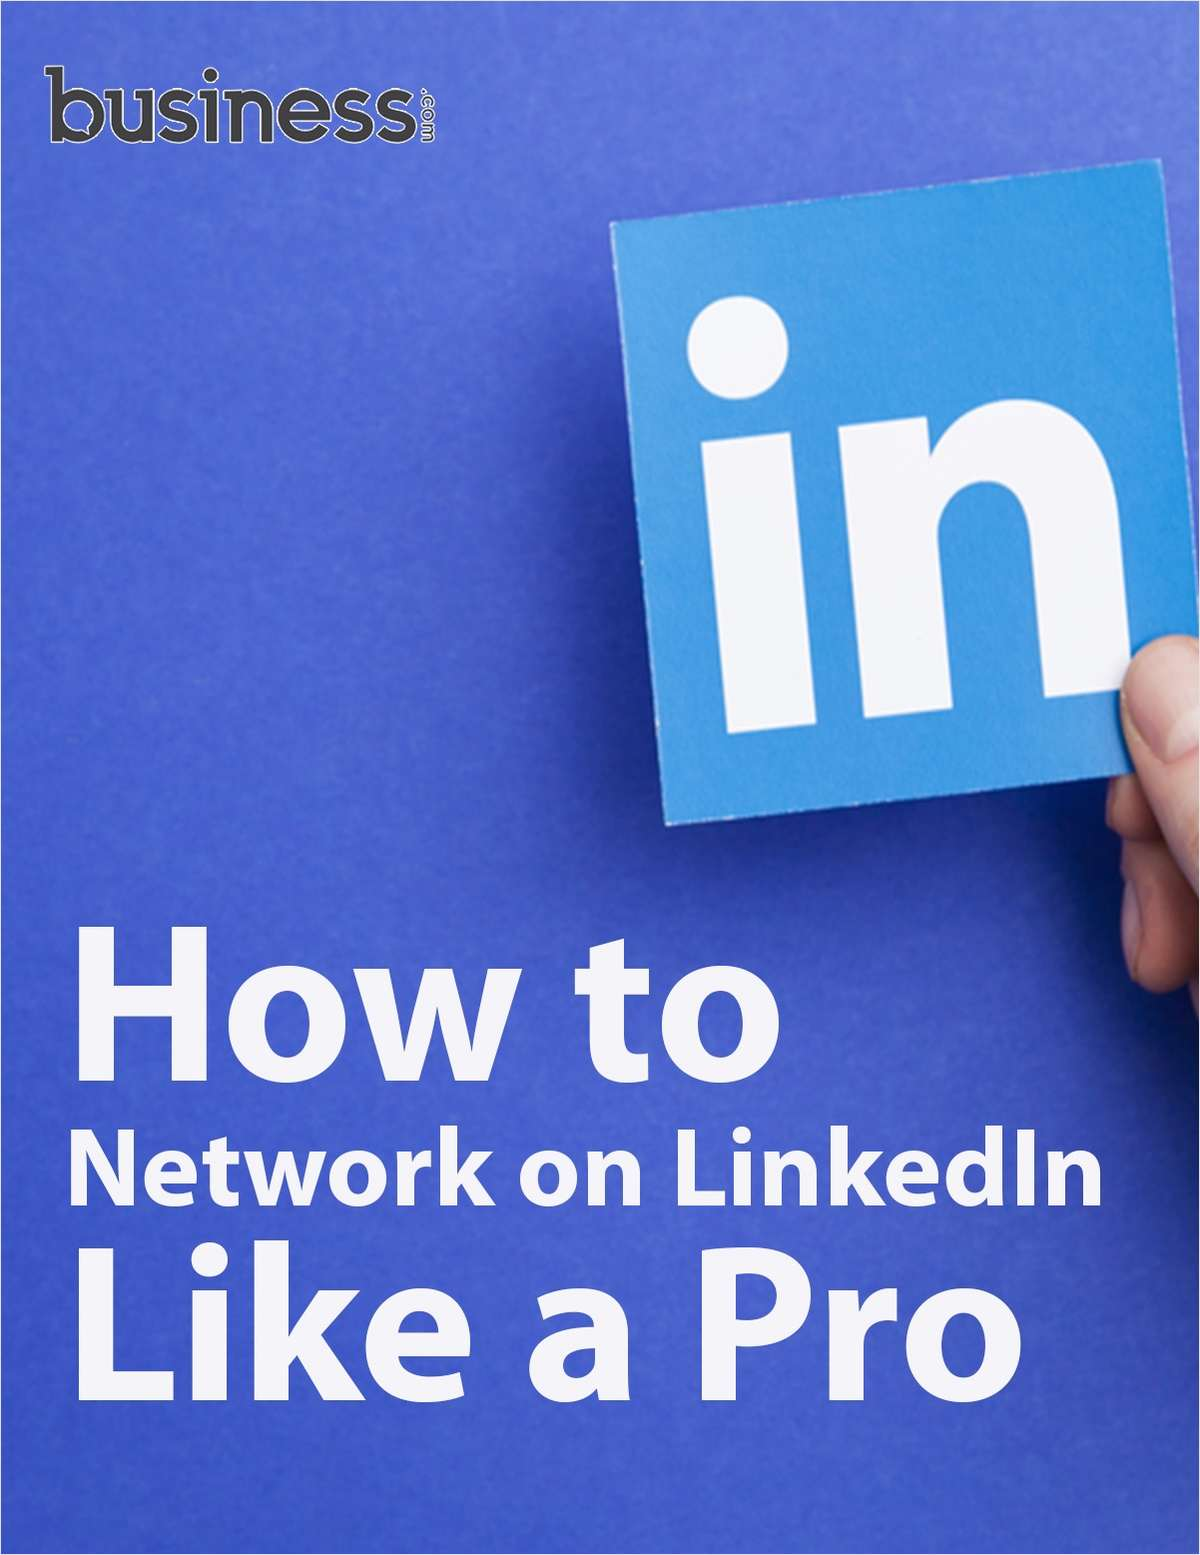 How to Network on LinkedIn Like a Pro